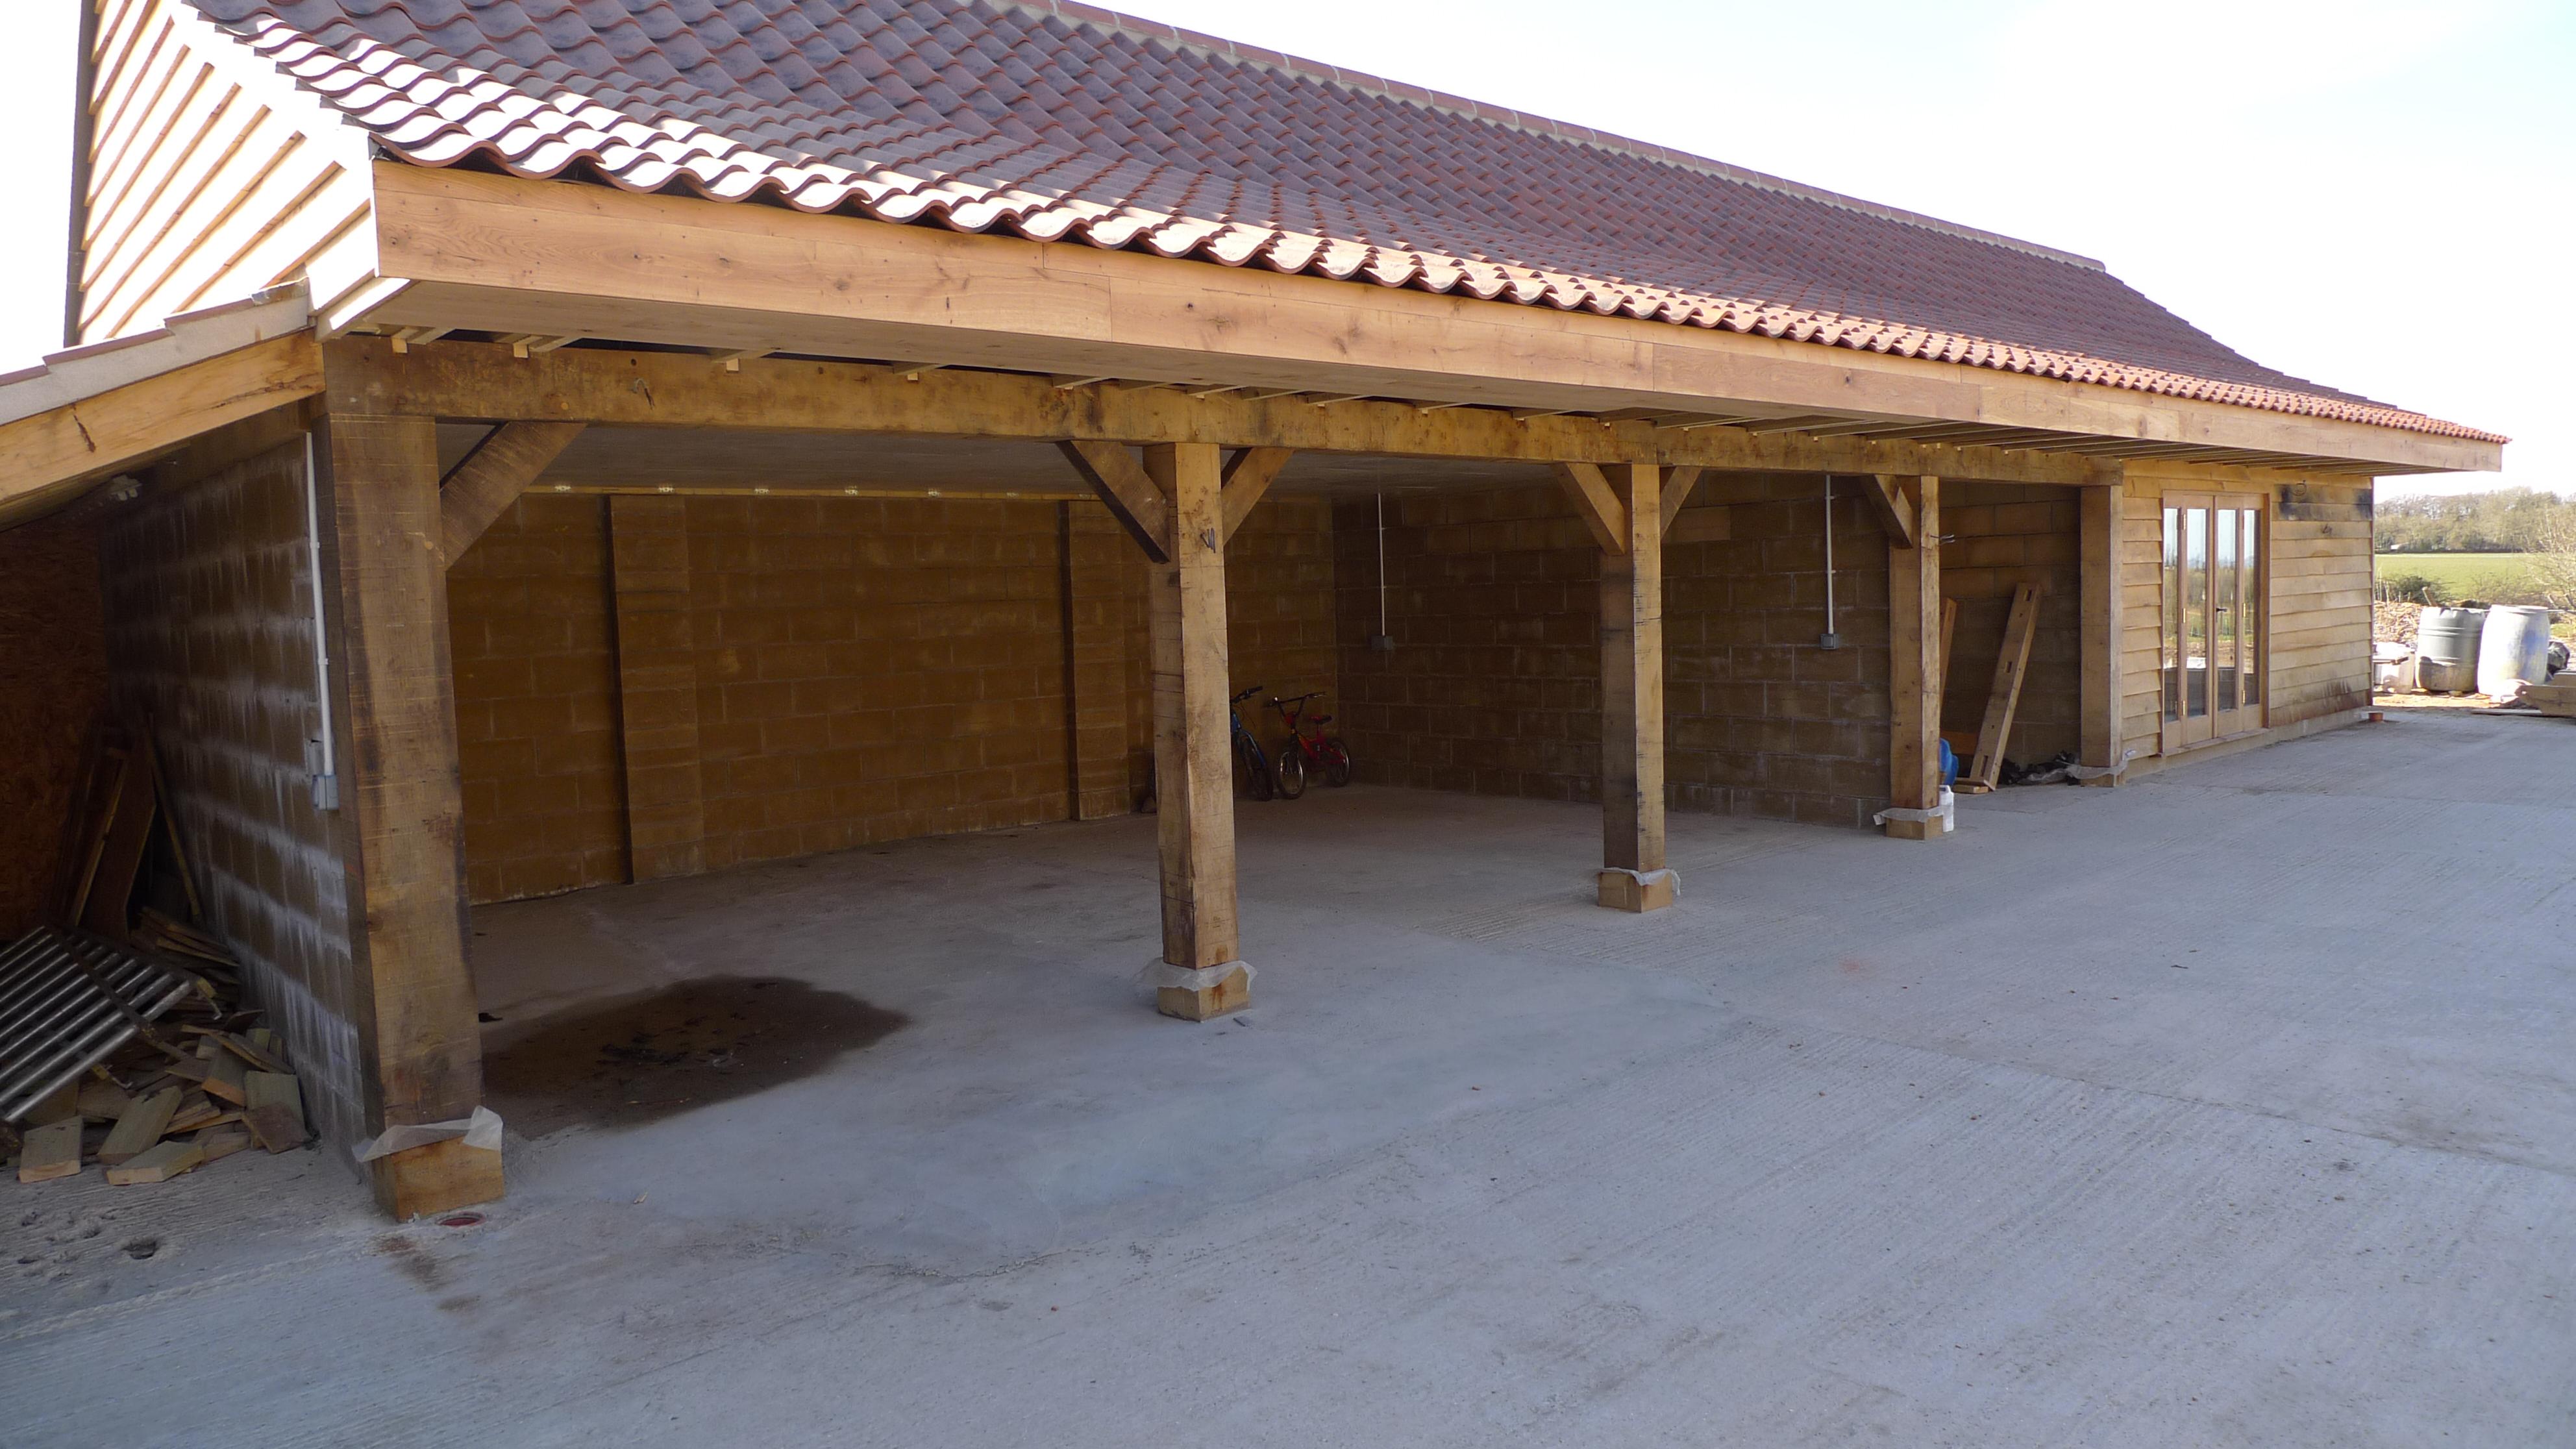 Garages and car ports | Oak Timber Framing & Carpentry in France